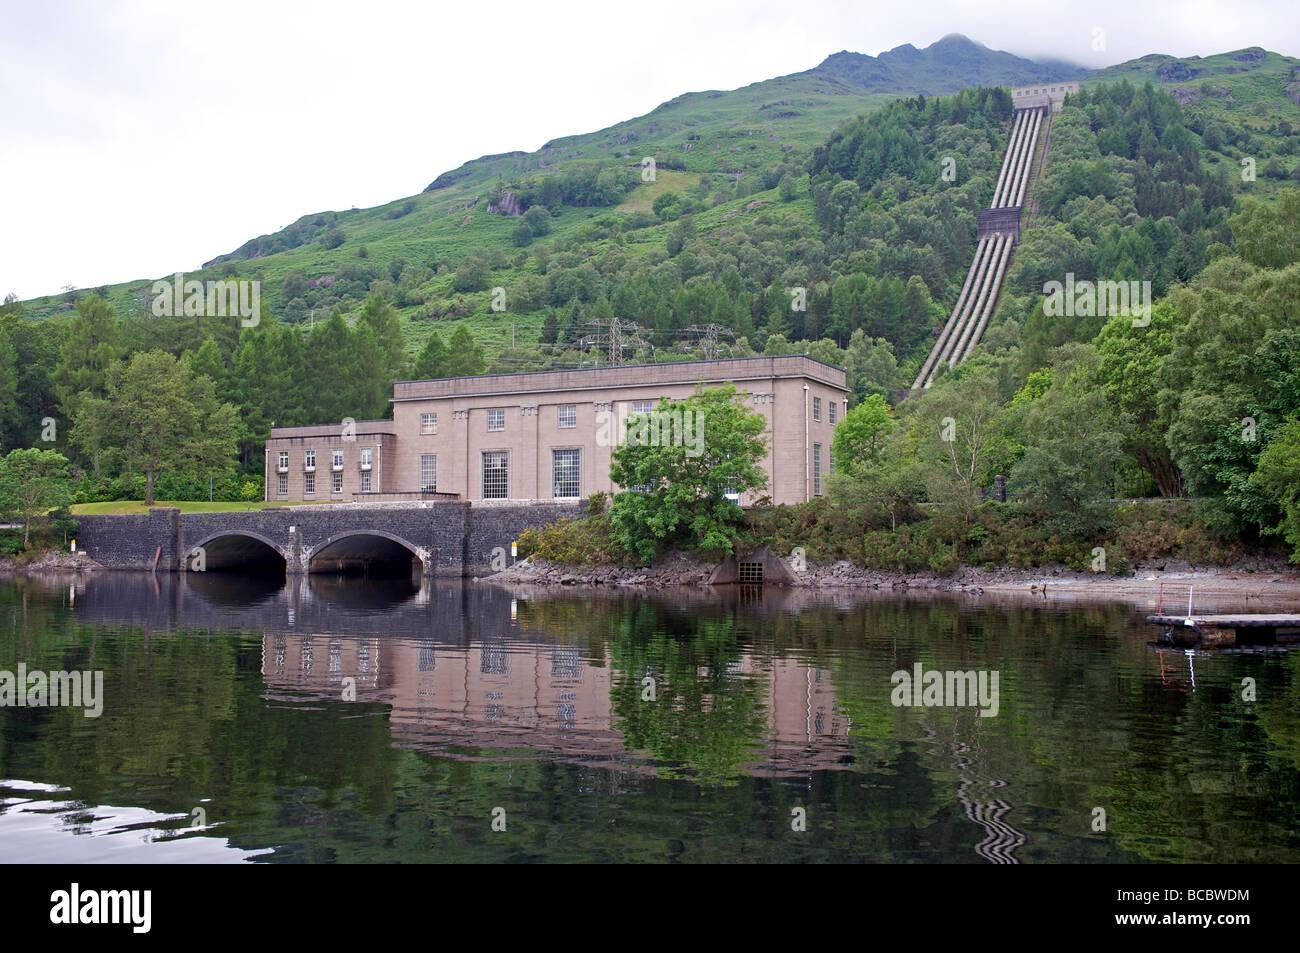 Hydro Electric Power Station Scotland Stock Photo